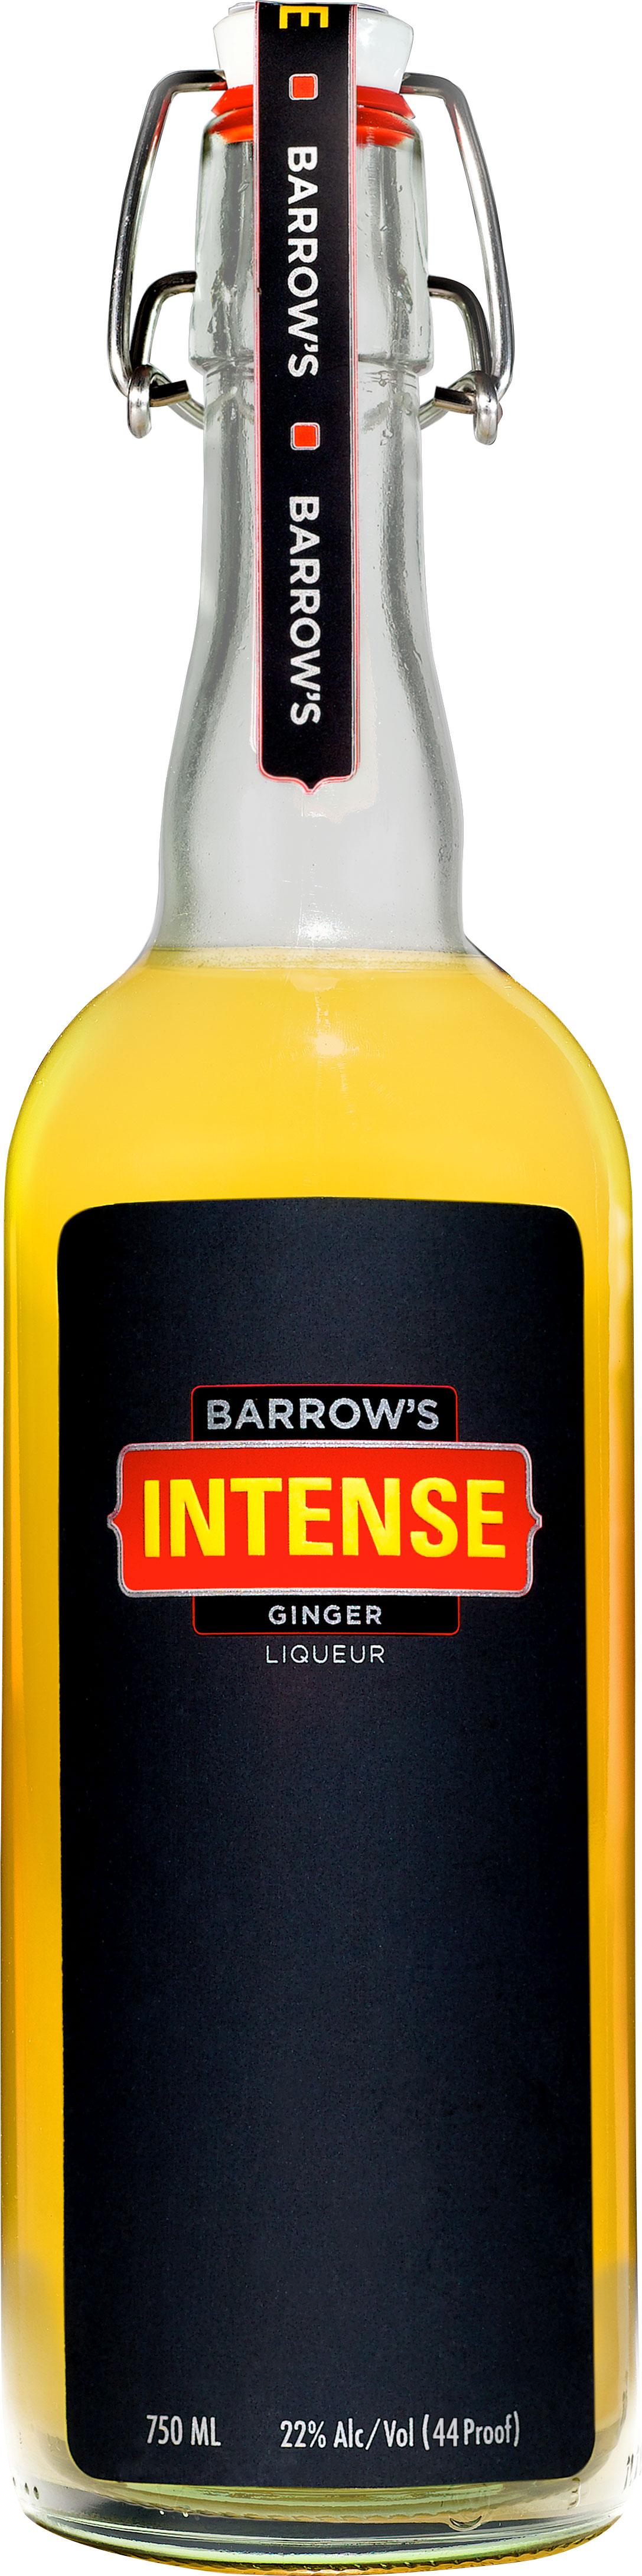 Barrow's Intense Ginger Liqueur